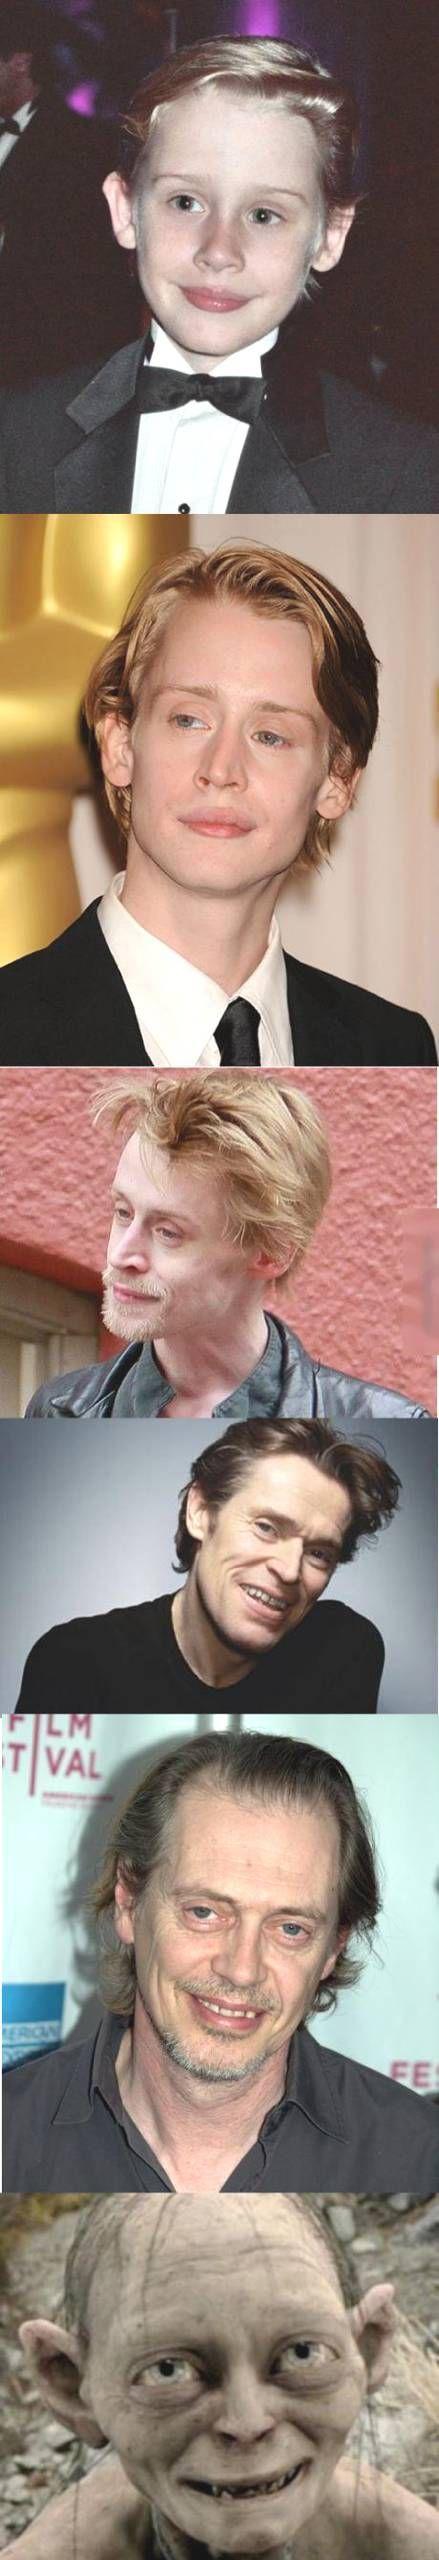 The Evolution of Macauley Culkin! So funny, so sad!